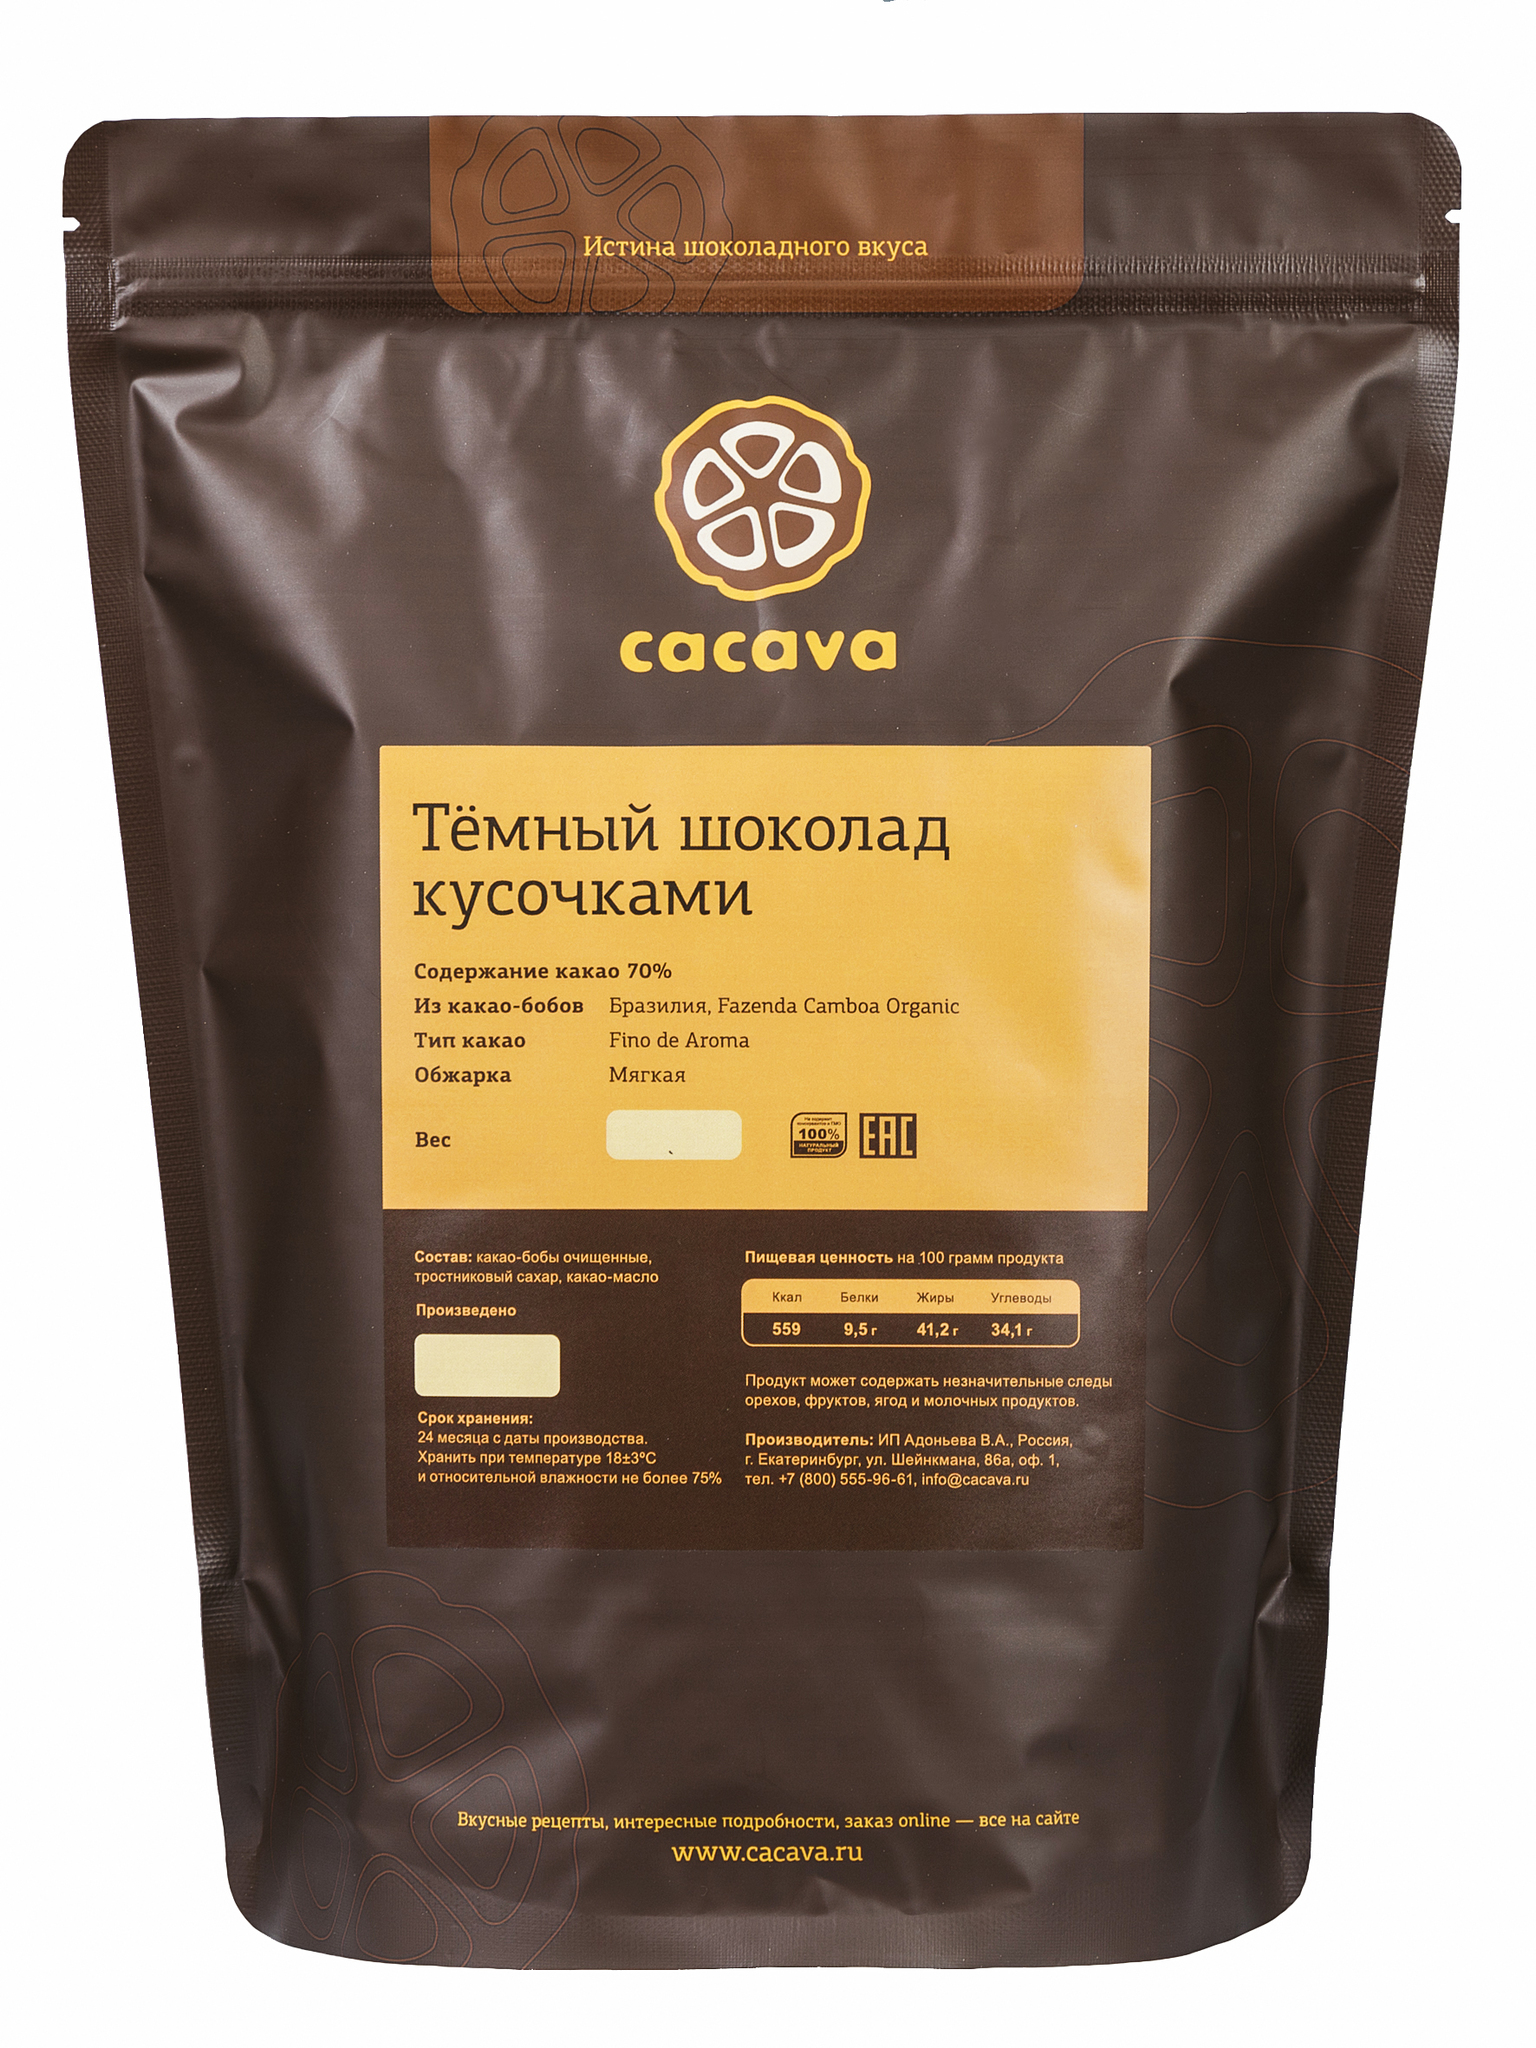 Тёмный шоколад 70 % какао (Бразилия, Fazenda Camboa), упаковка 1 кг